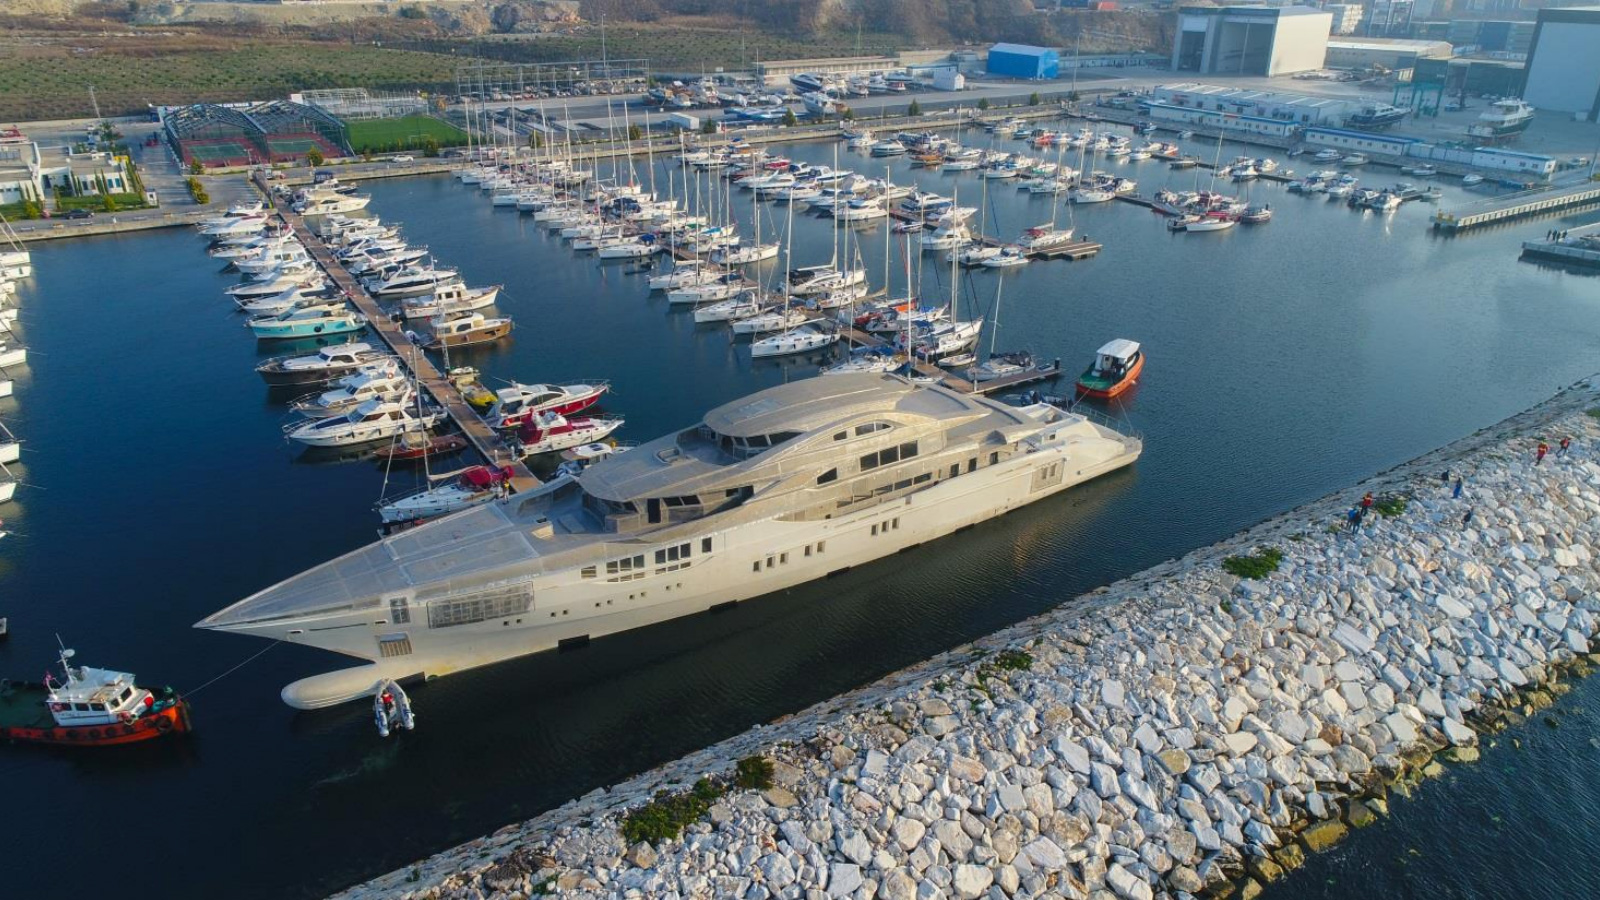 aerial-view-of-the-bilgin-263-yacht